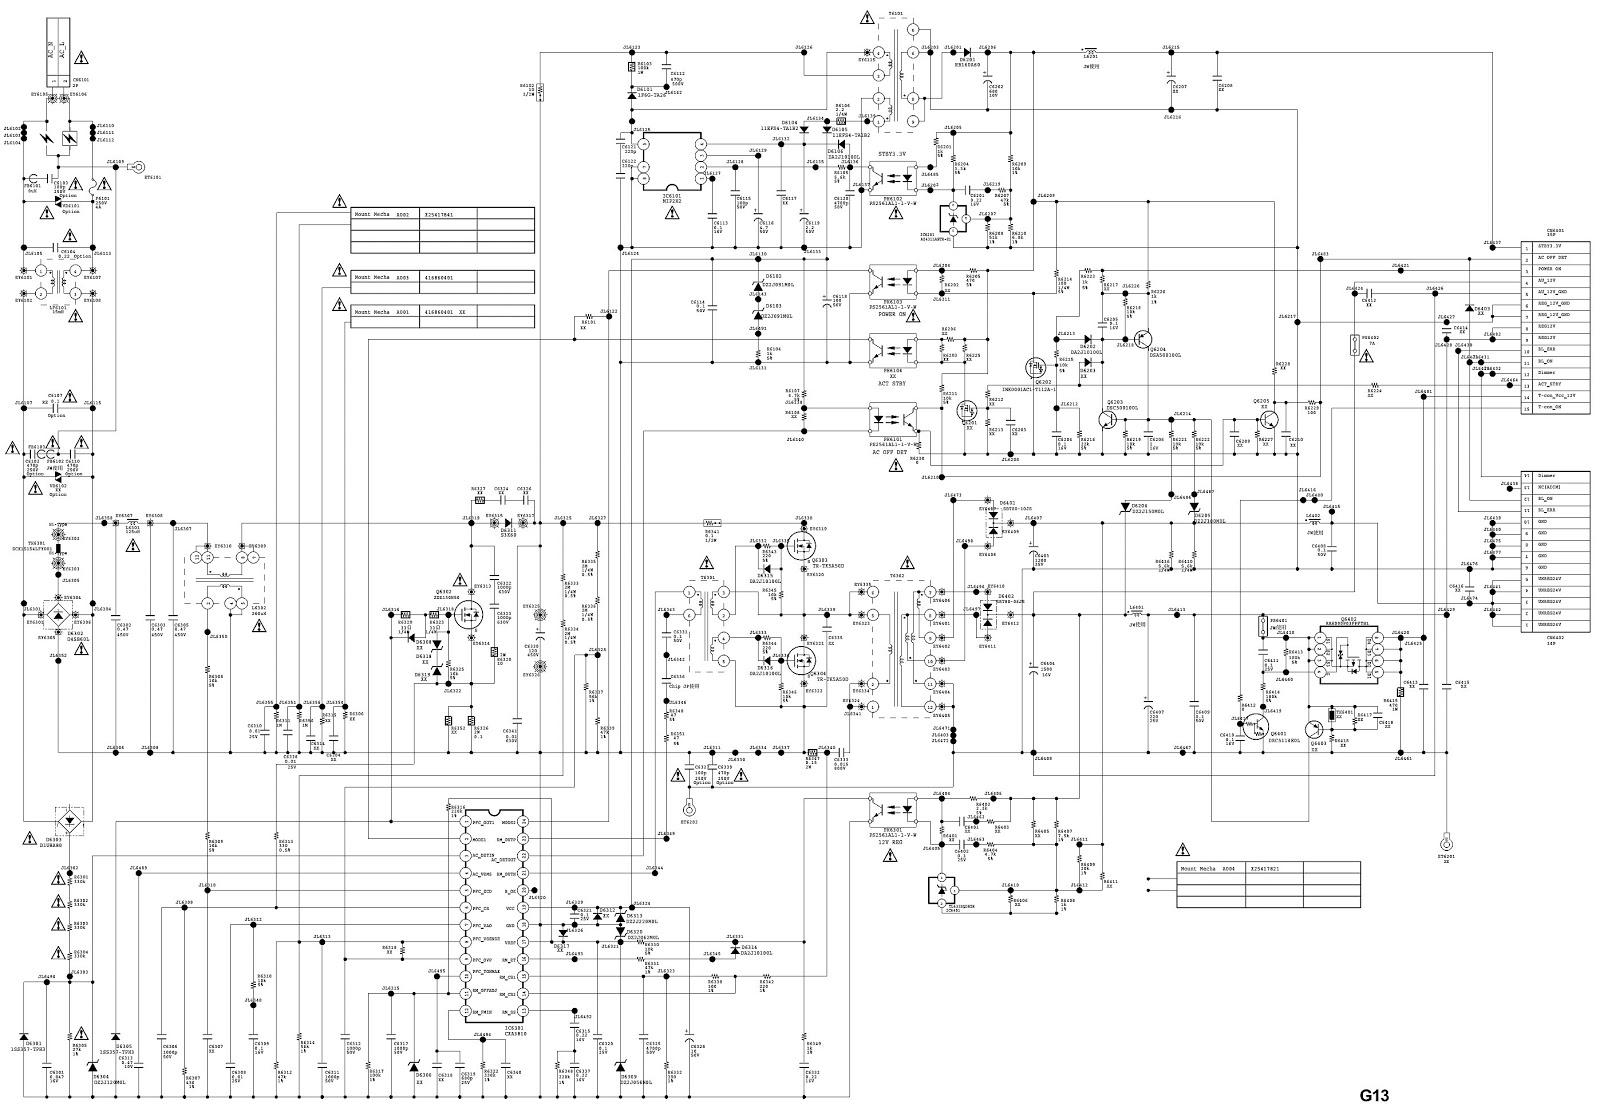 Sony Television Circuit Diagram Manual Of Wiring T V Kdl32bx327 40bx427 Chassis Az2 Ek Lcd Digital Color Tv Smps Rh Schematicscom Blogspot Com Pdf Crt Schematic